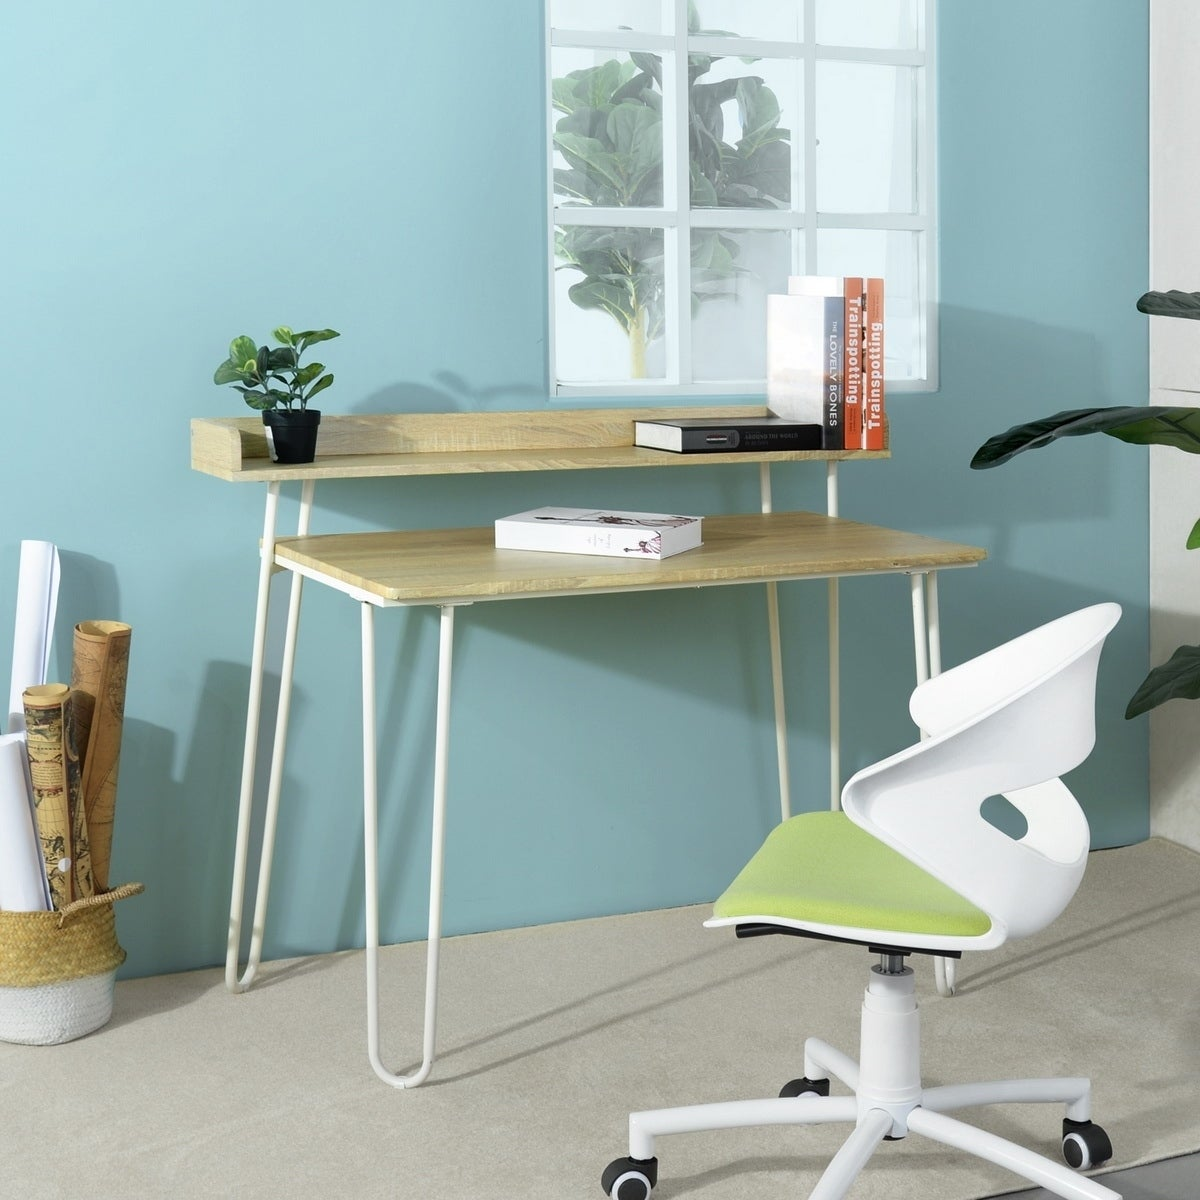 Furniturer Computer Desk With Riser Shelf Organizer For Home Study Room